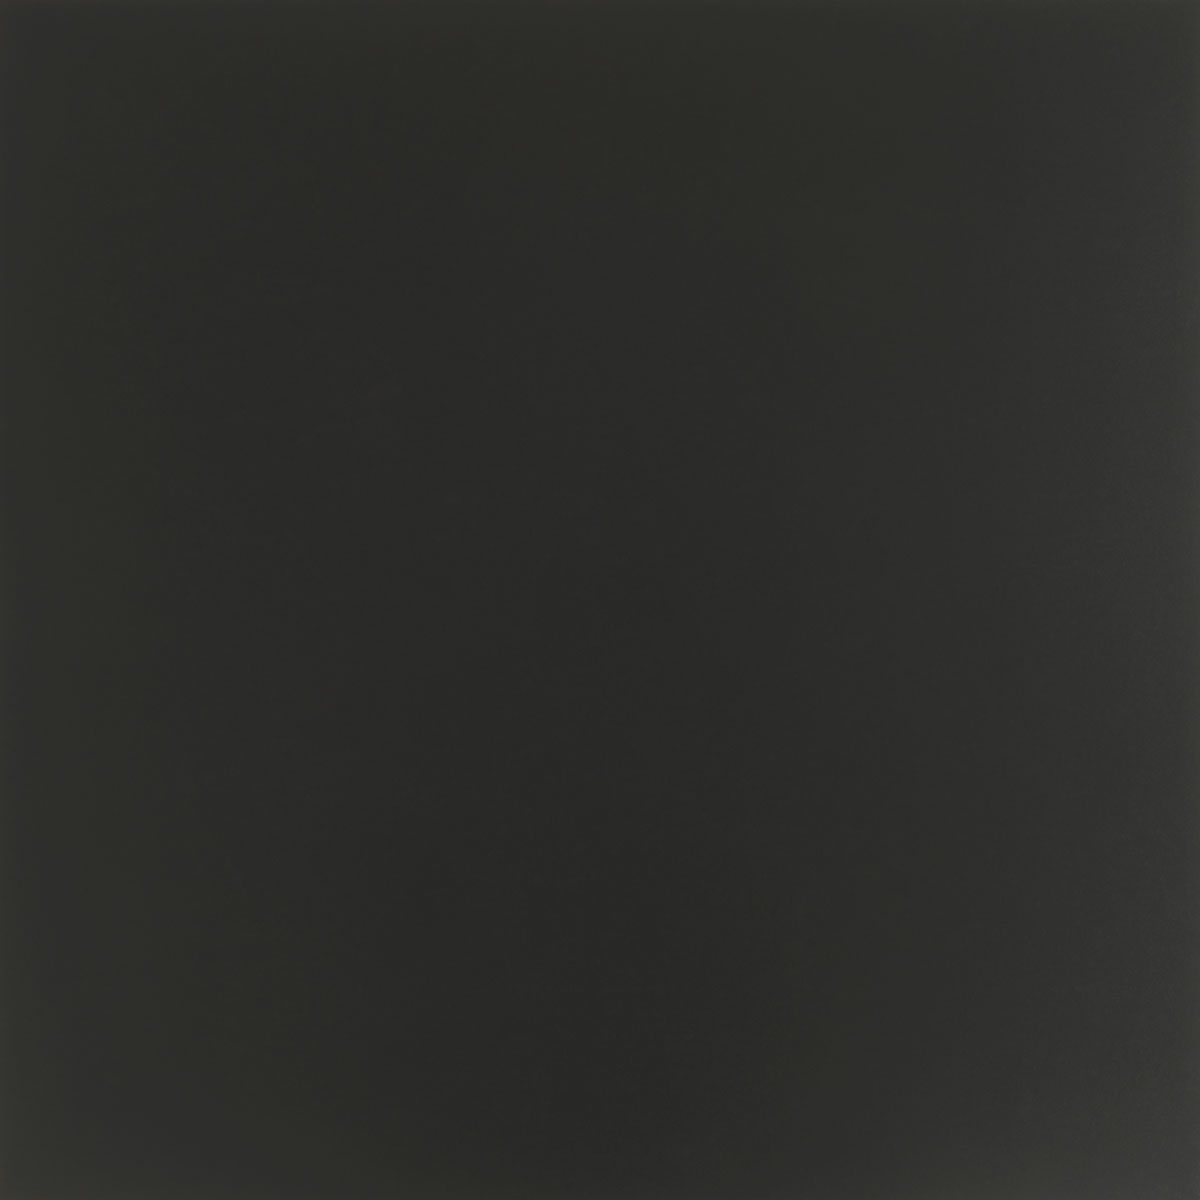 Signorino: Total Black